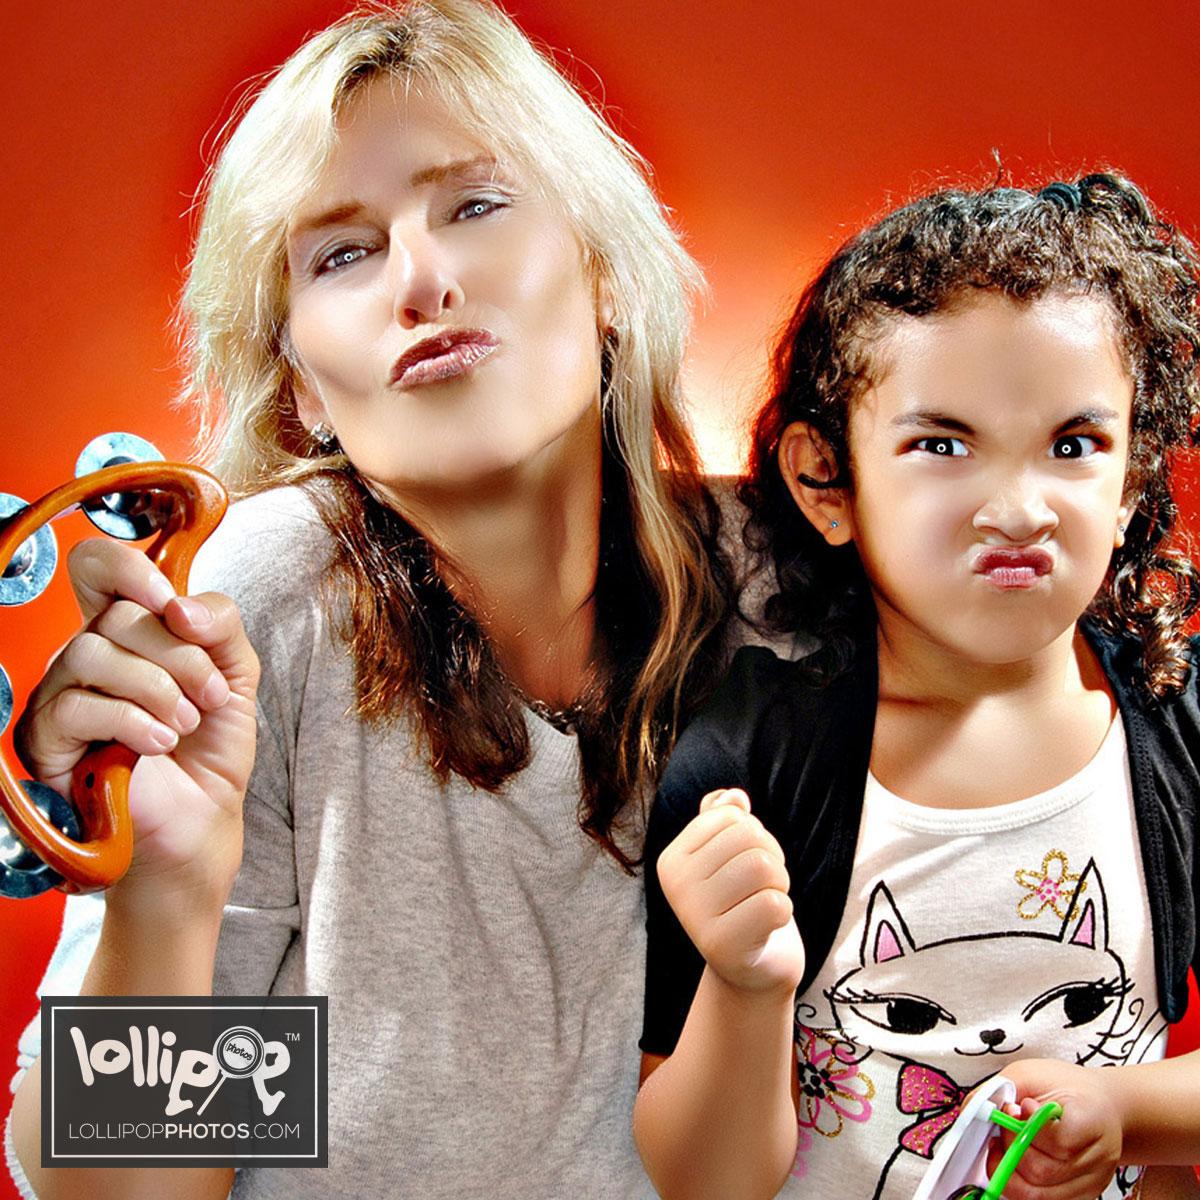 msdig-nora-canfield-lollipop-photos-275.jpg